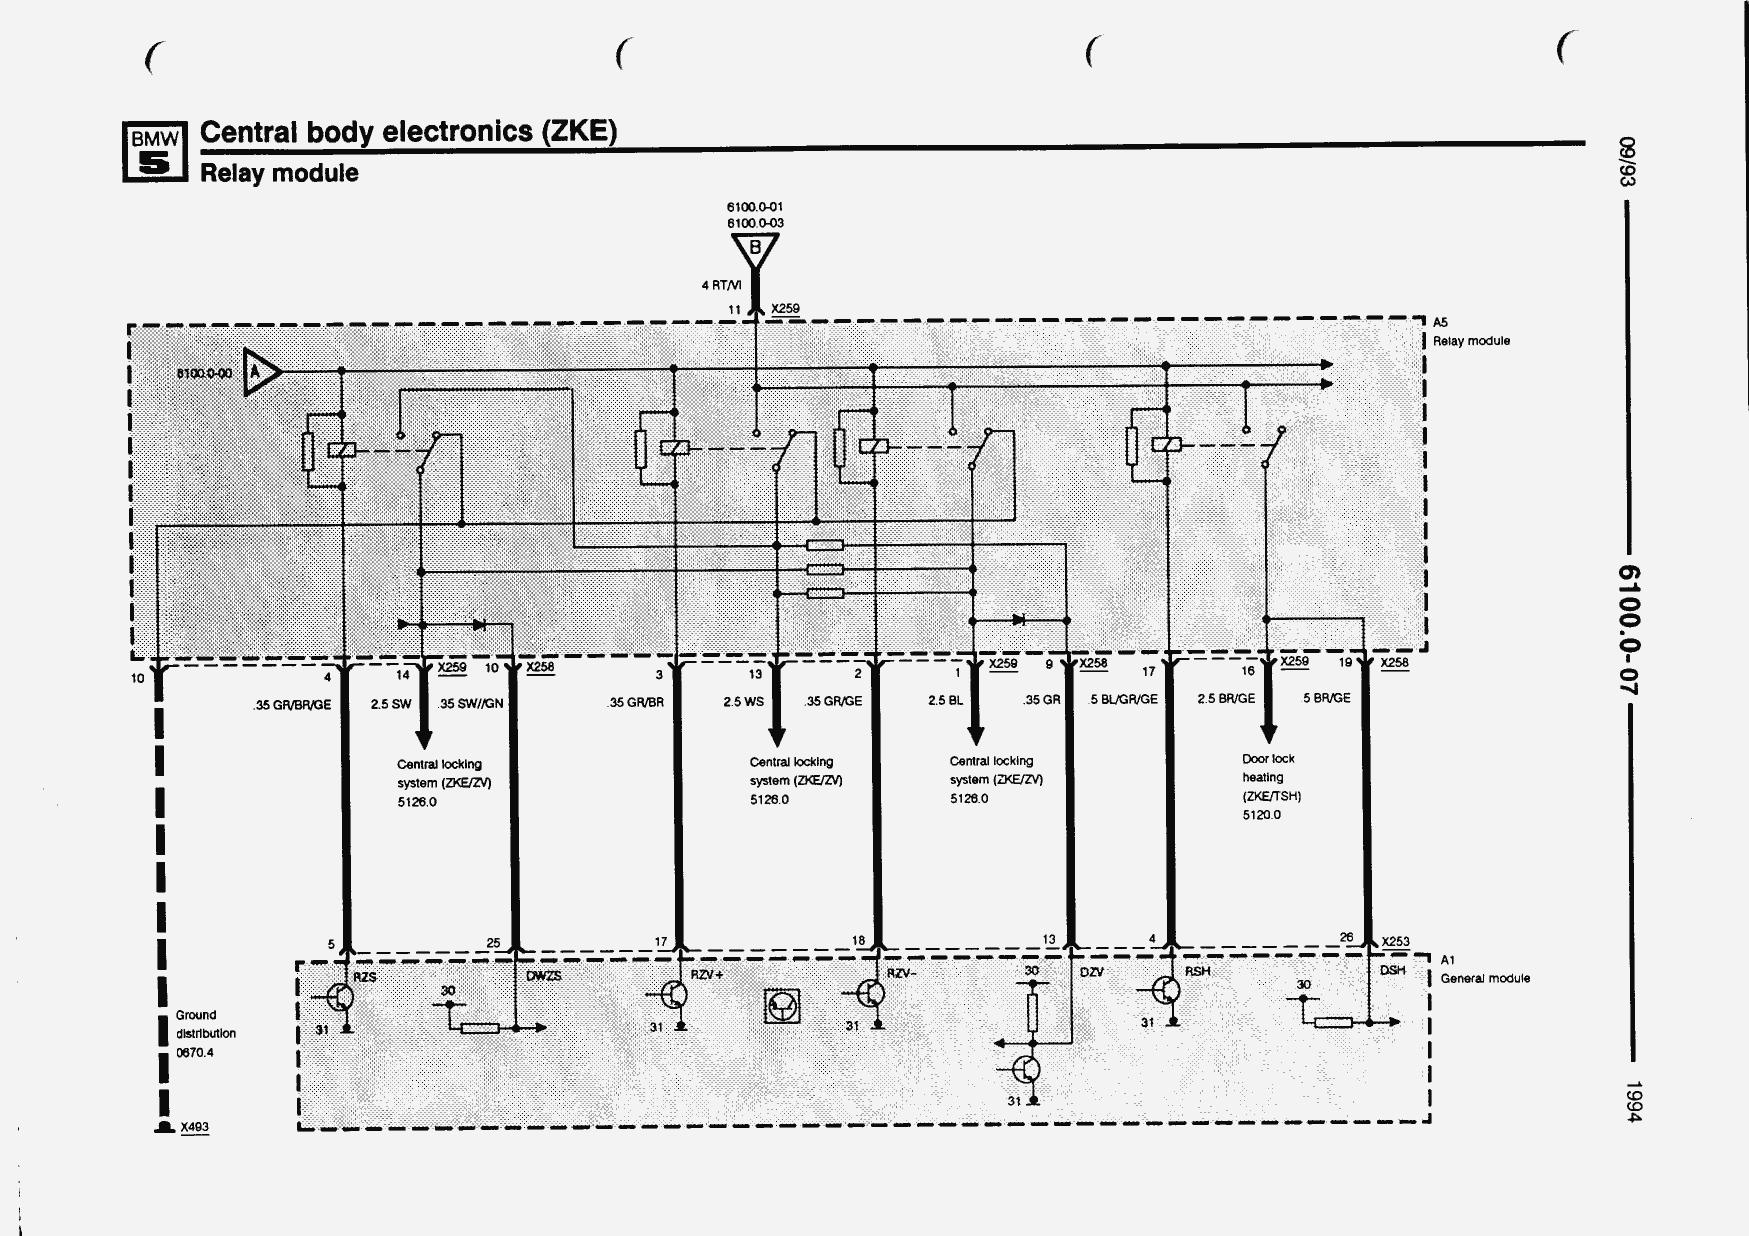 Electrical troubleshooting manual (5 Series - E34 (518i, 520i, 525td